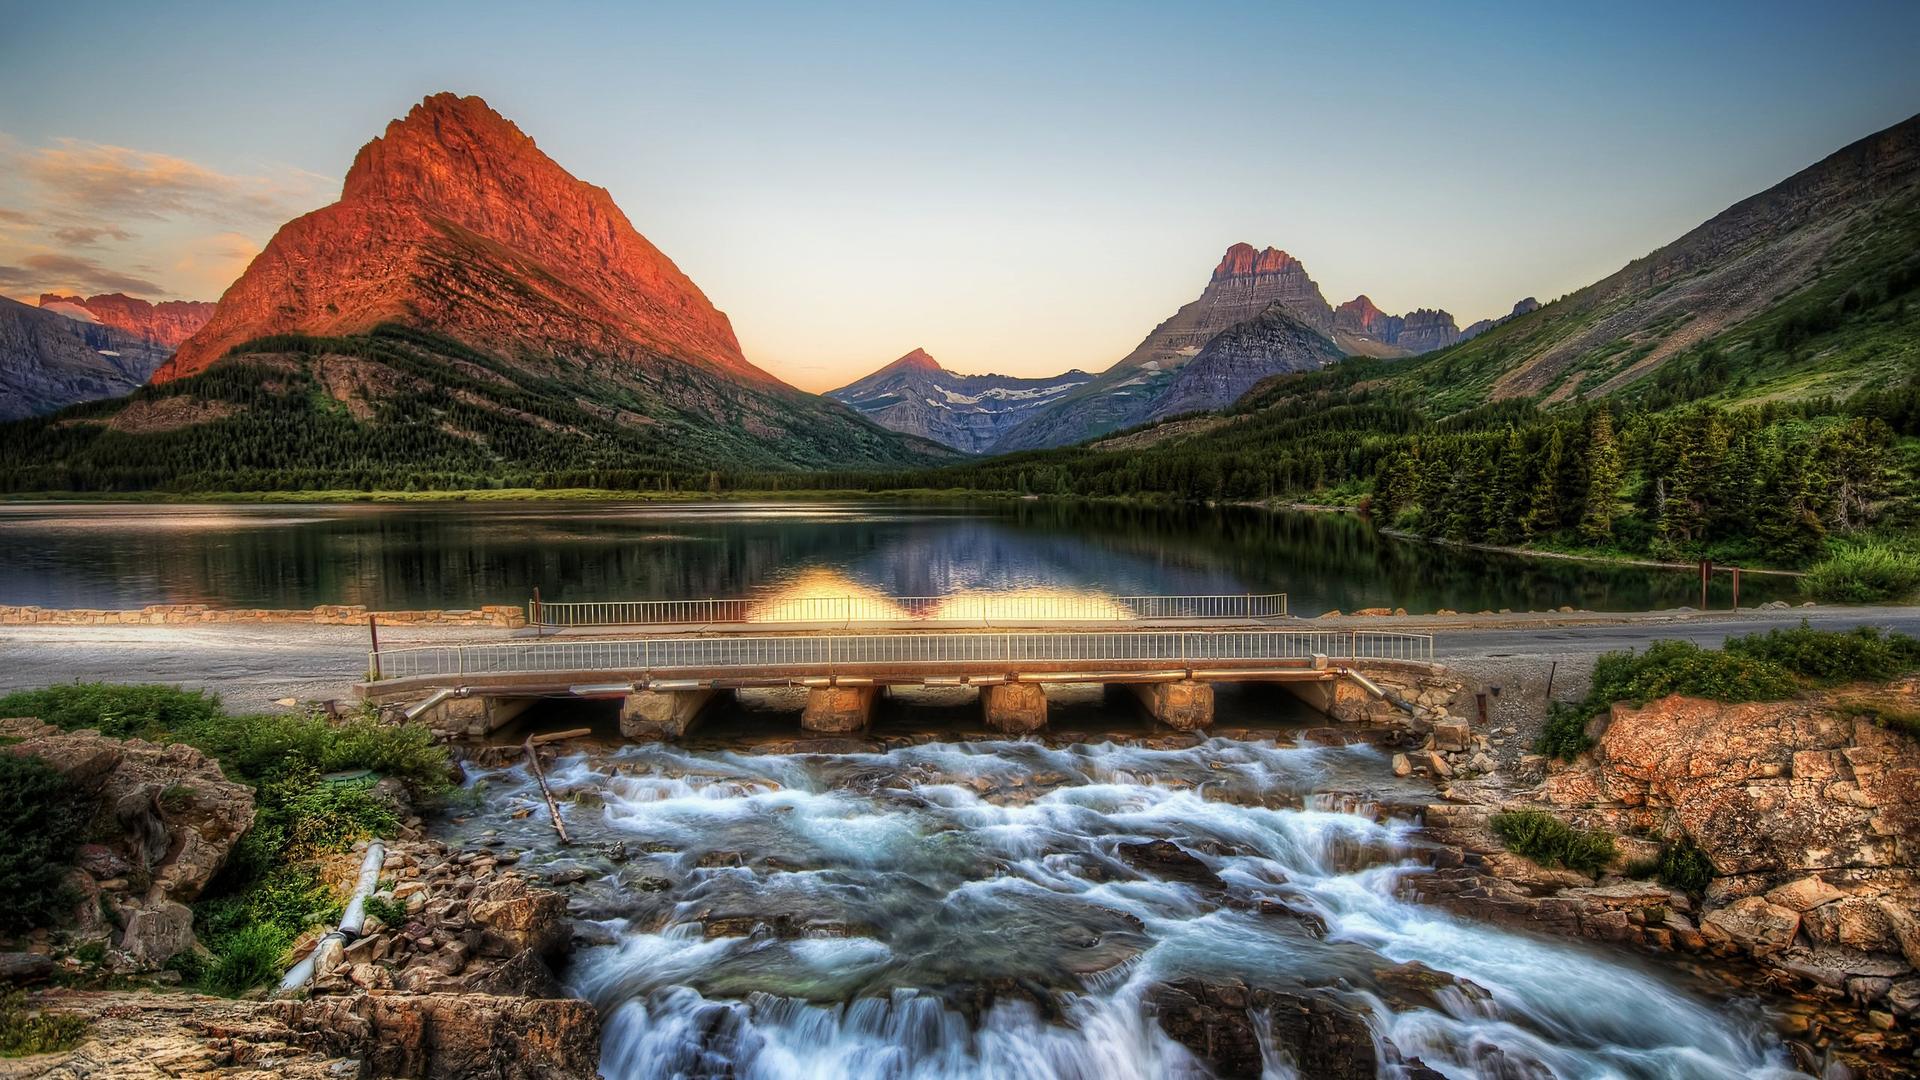 Montana Wallpaper 6826356 1920x1080